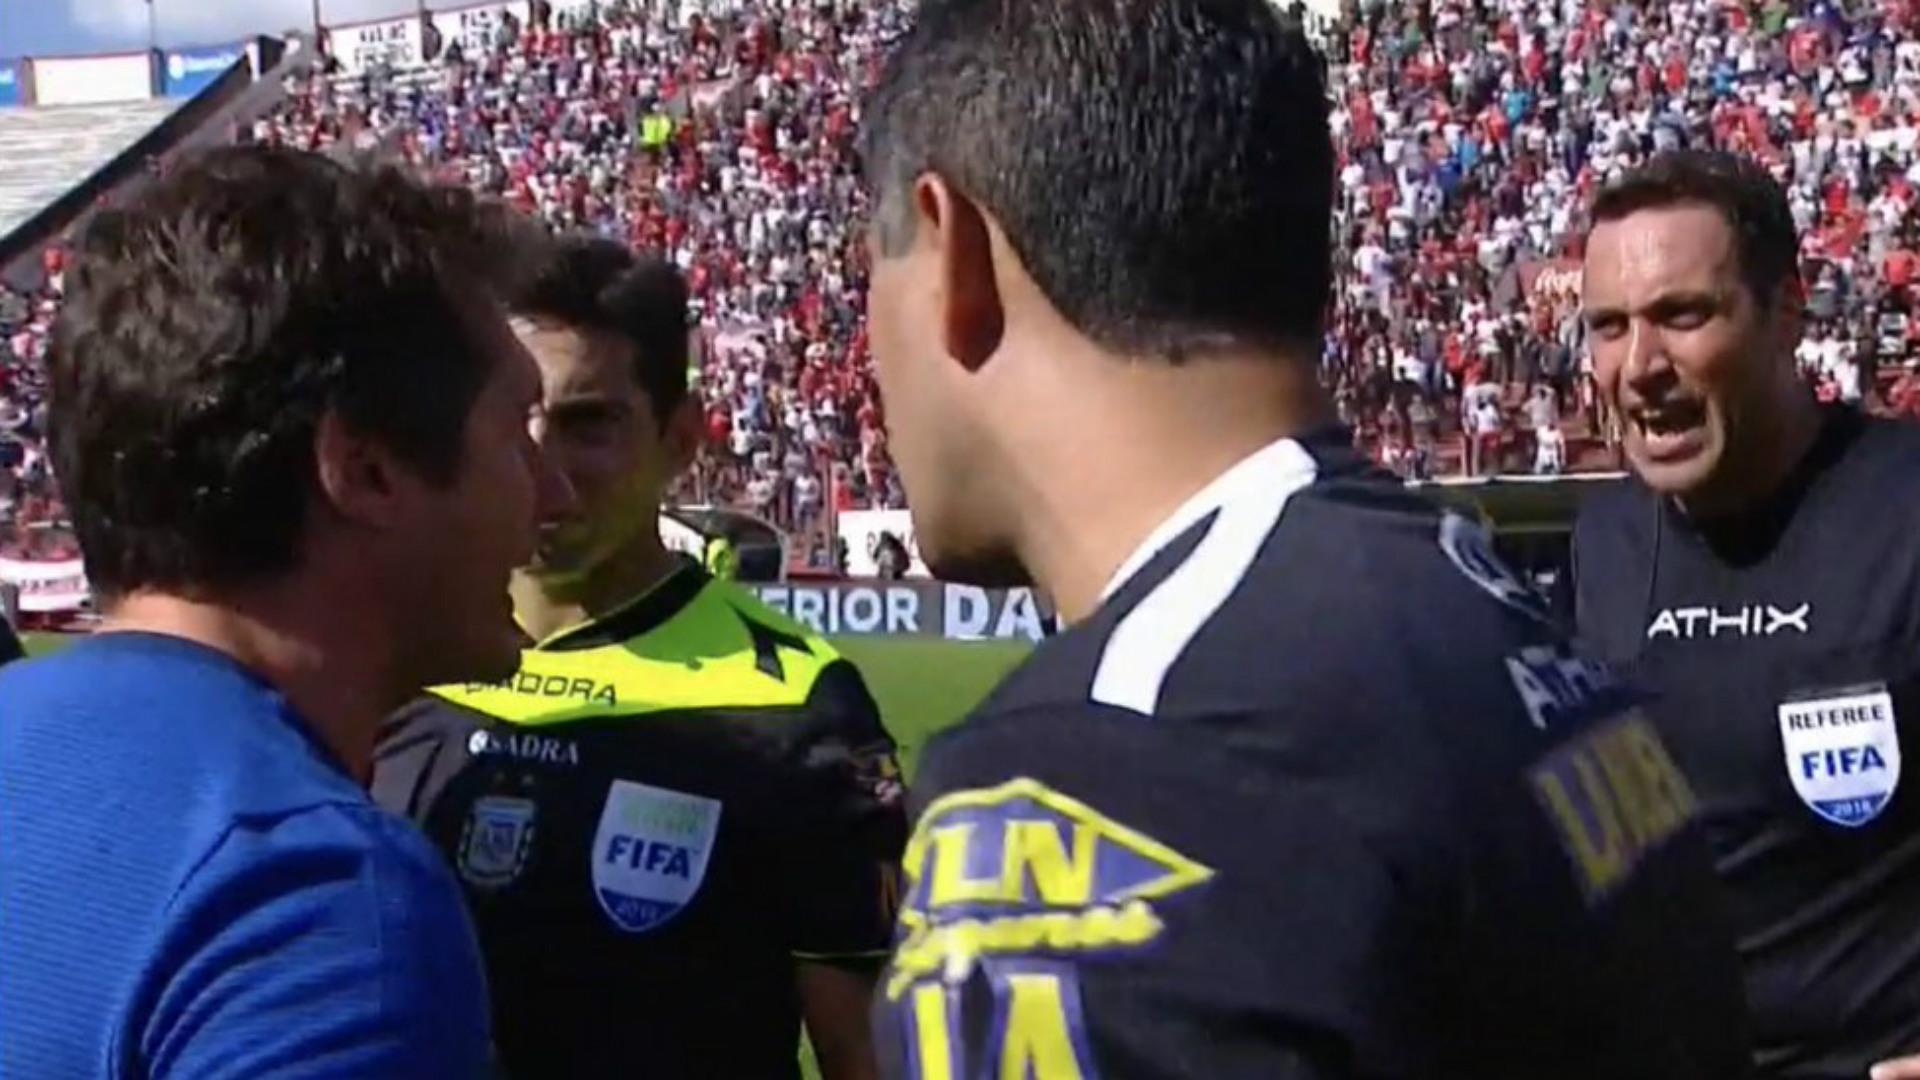 La bronca de Guillermo con Rapallini: